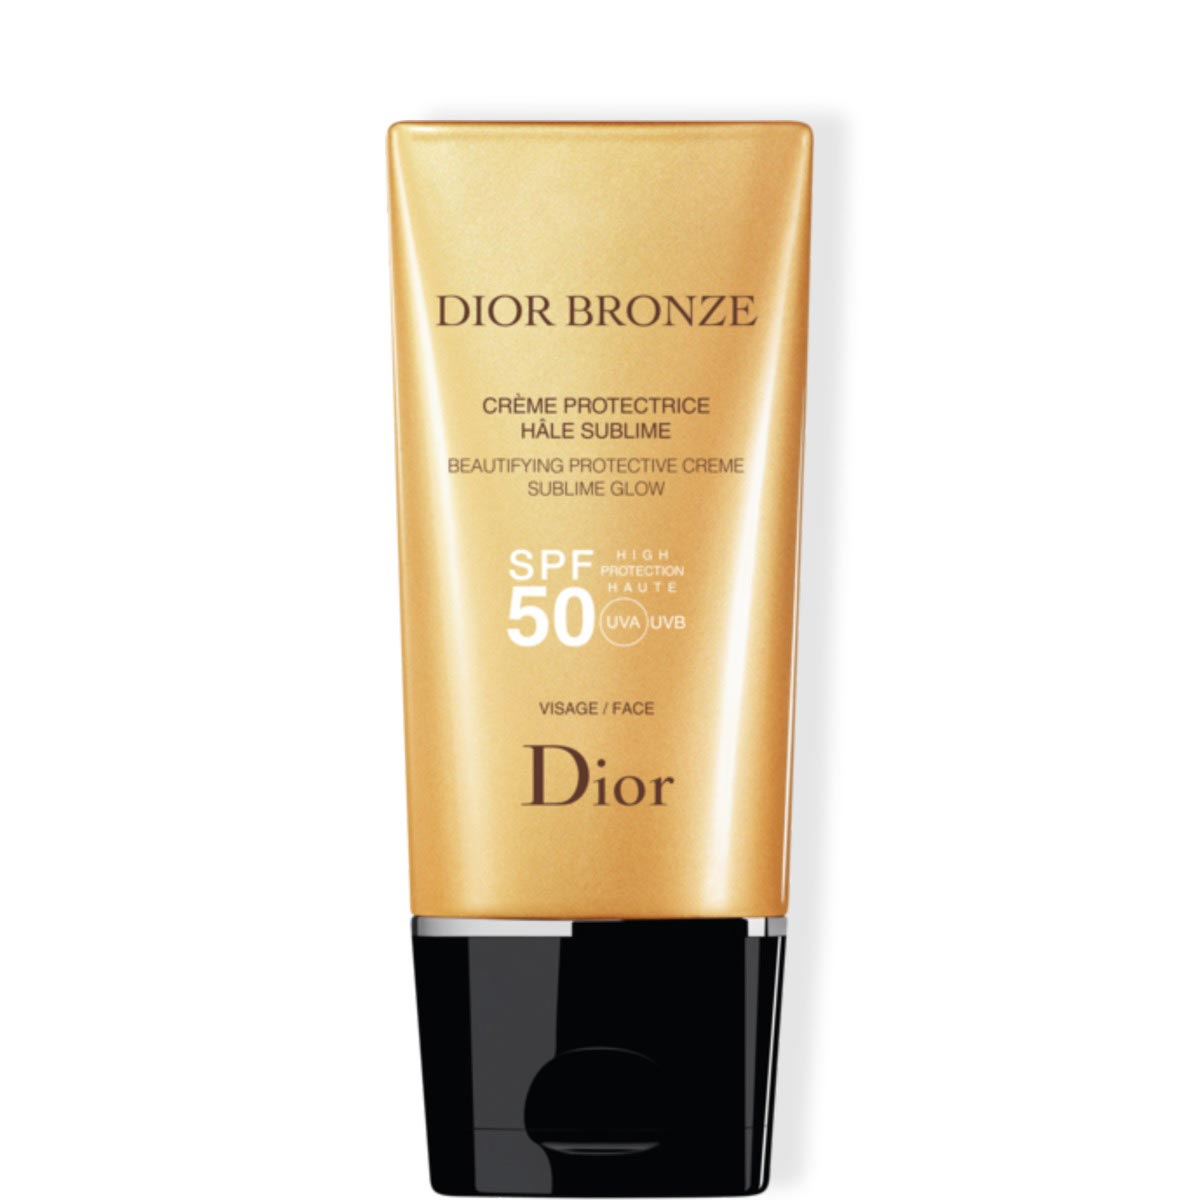 Dior - Dior Bronze - Crème Protectrice Hâle Sublime SPF 50